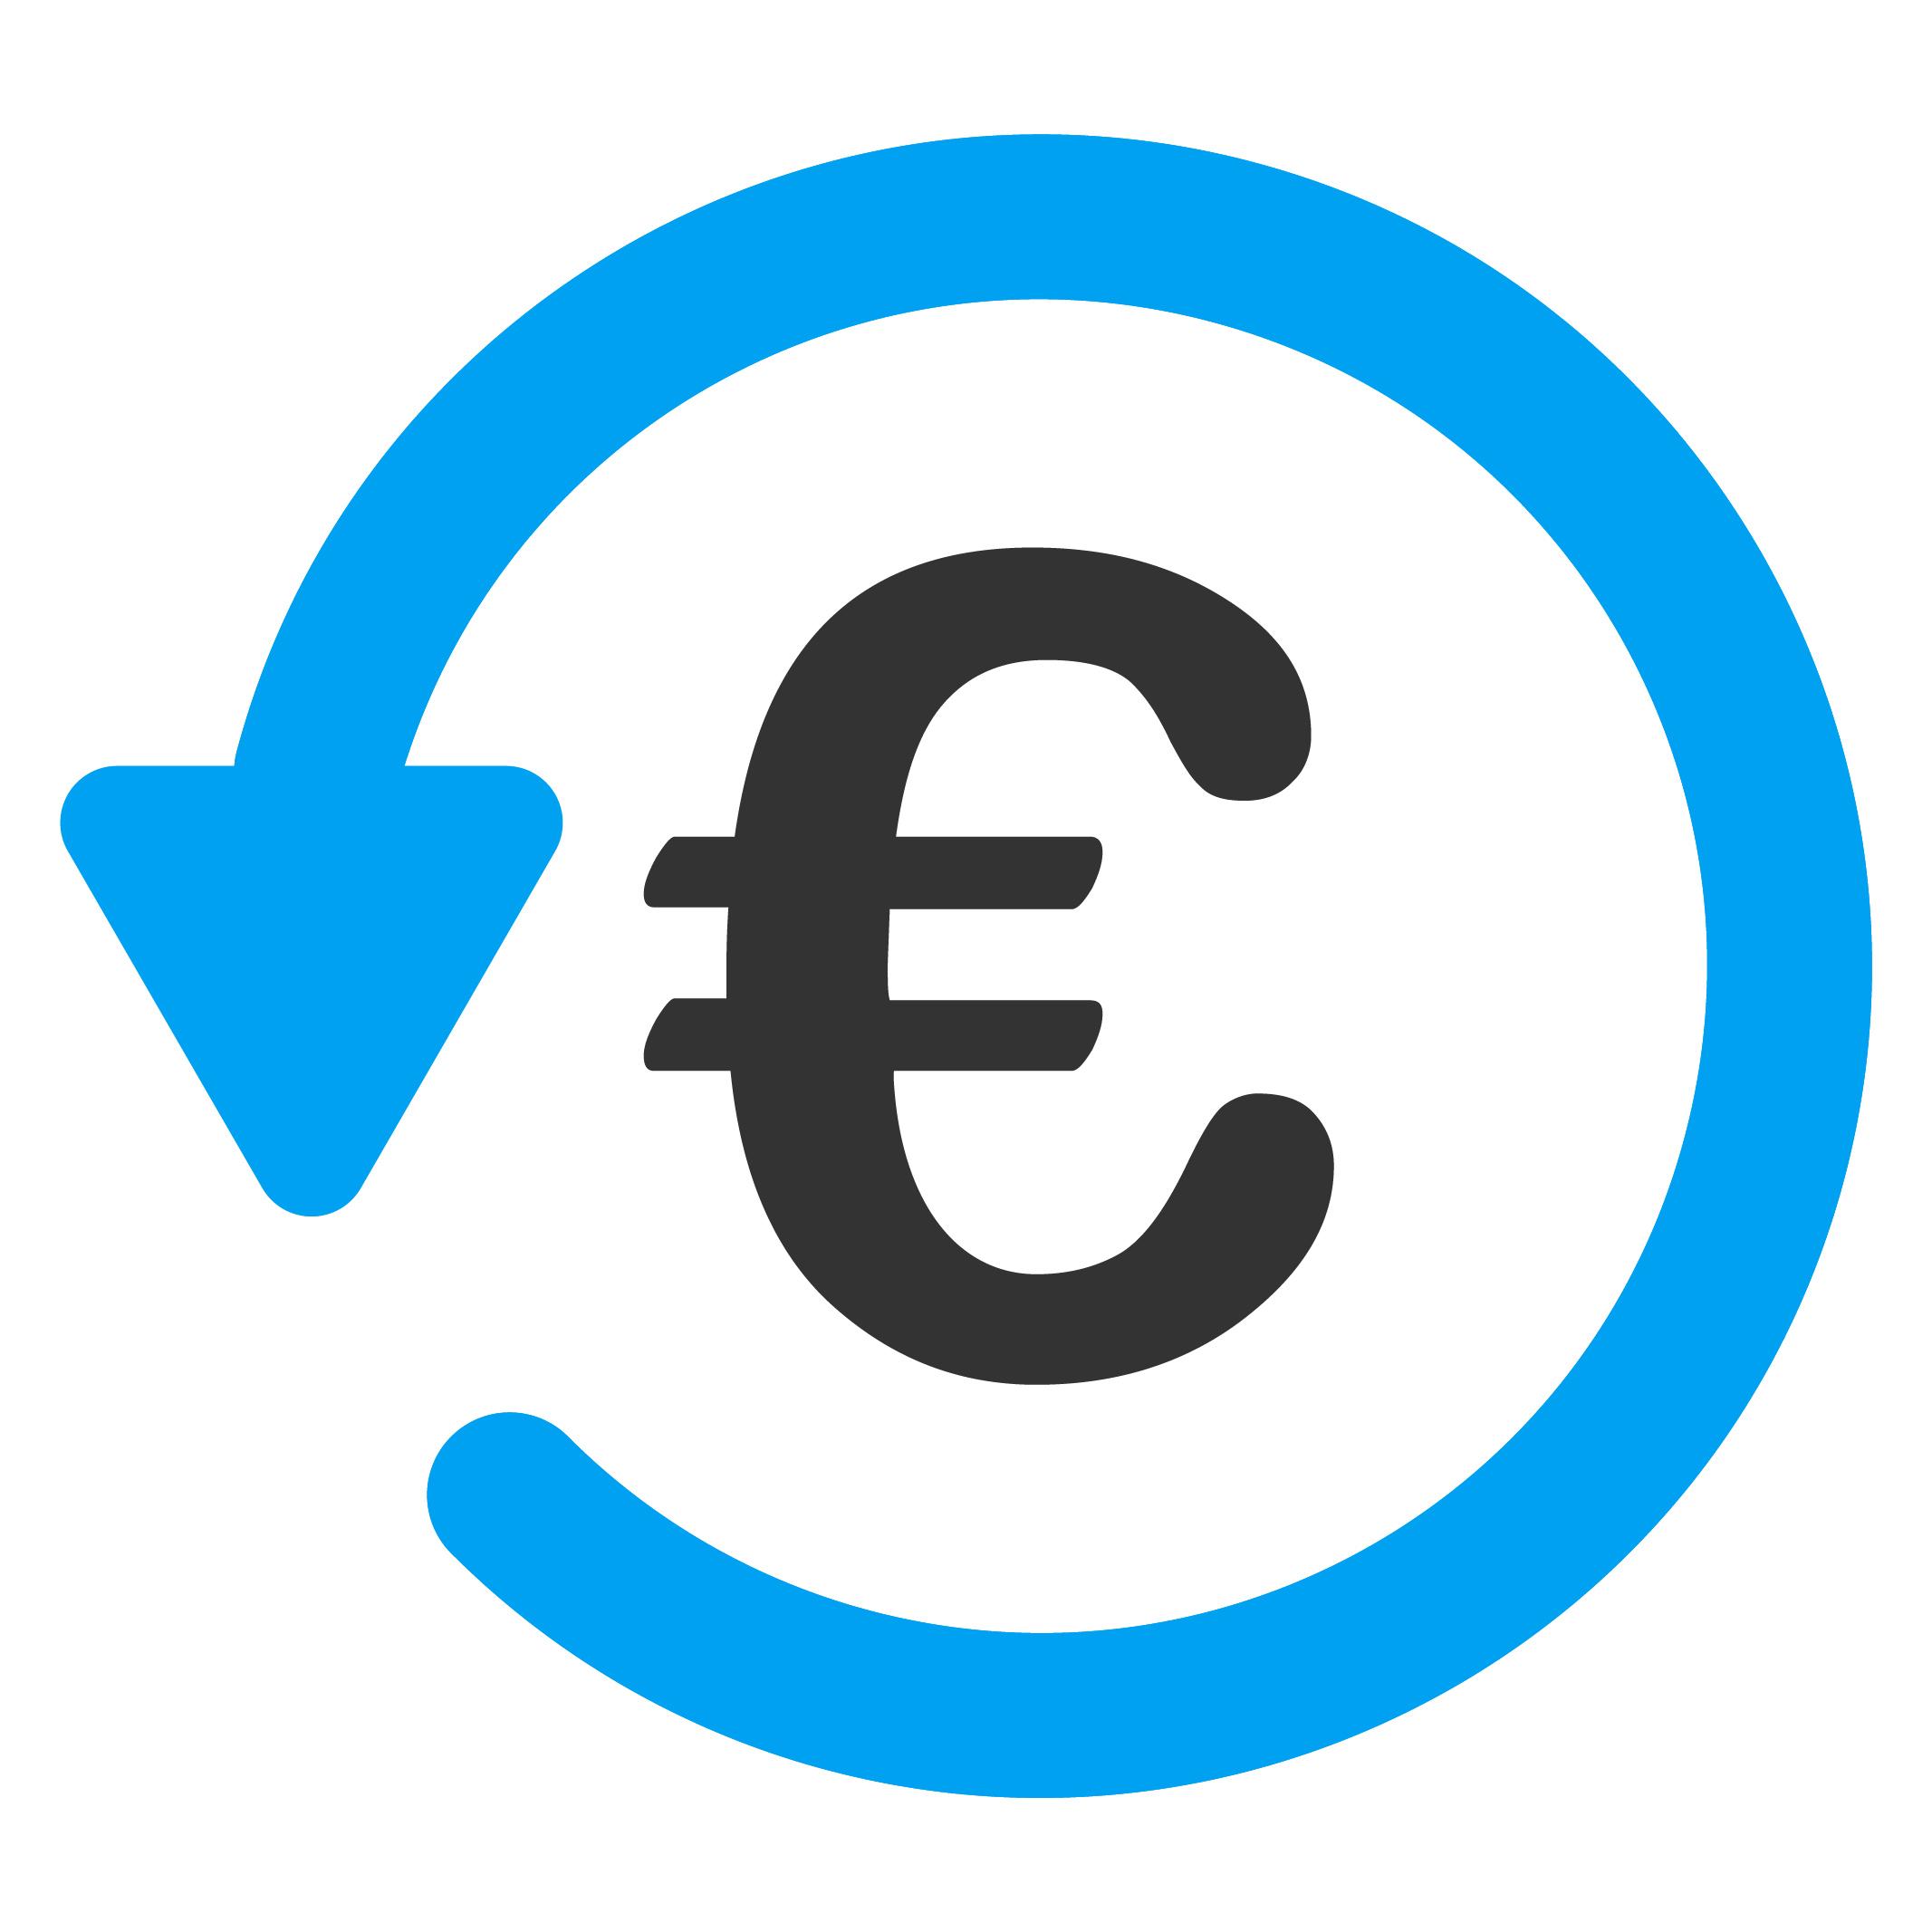 teruggave energiebelasting symbool